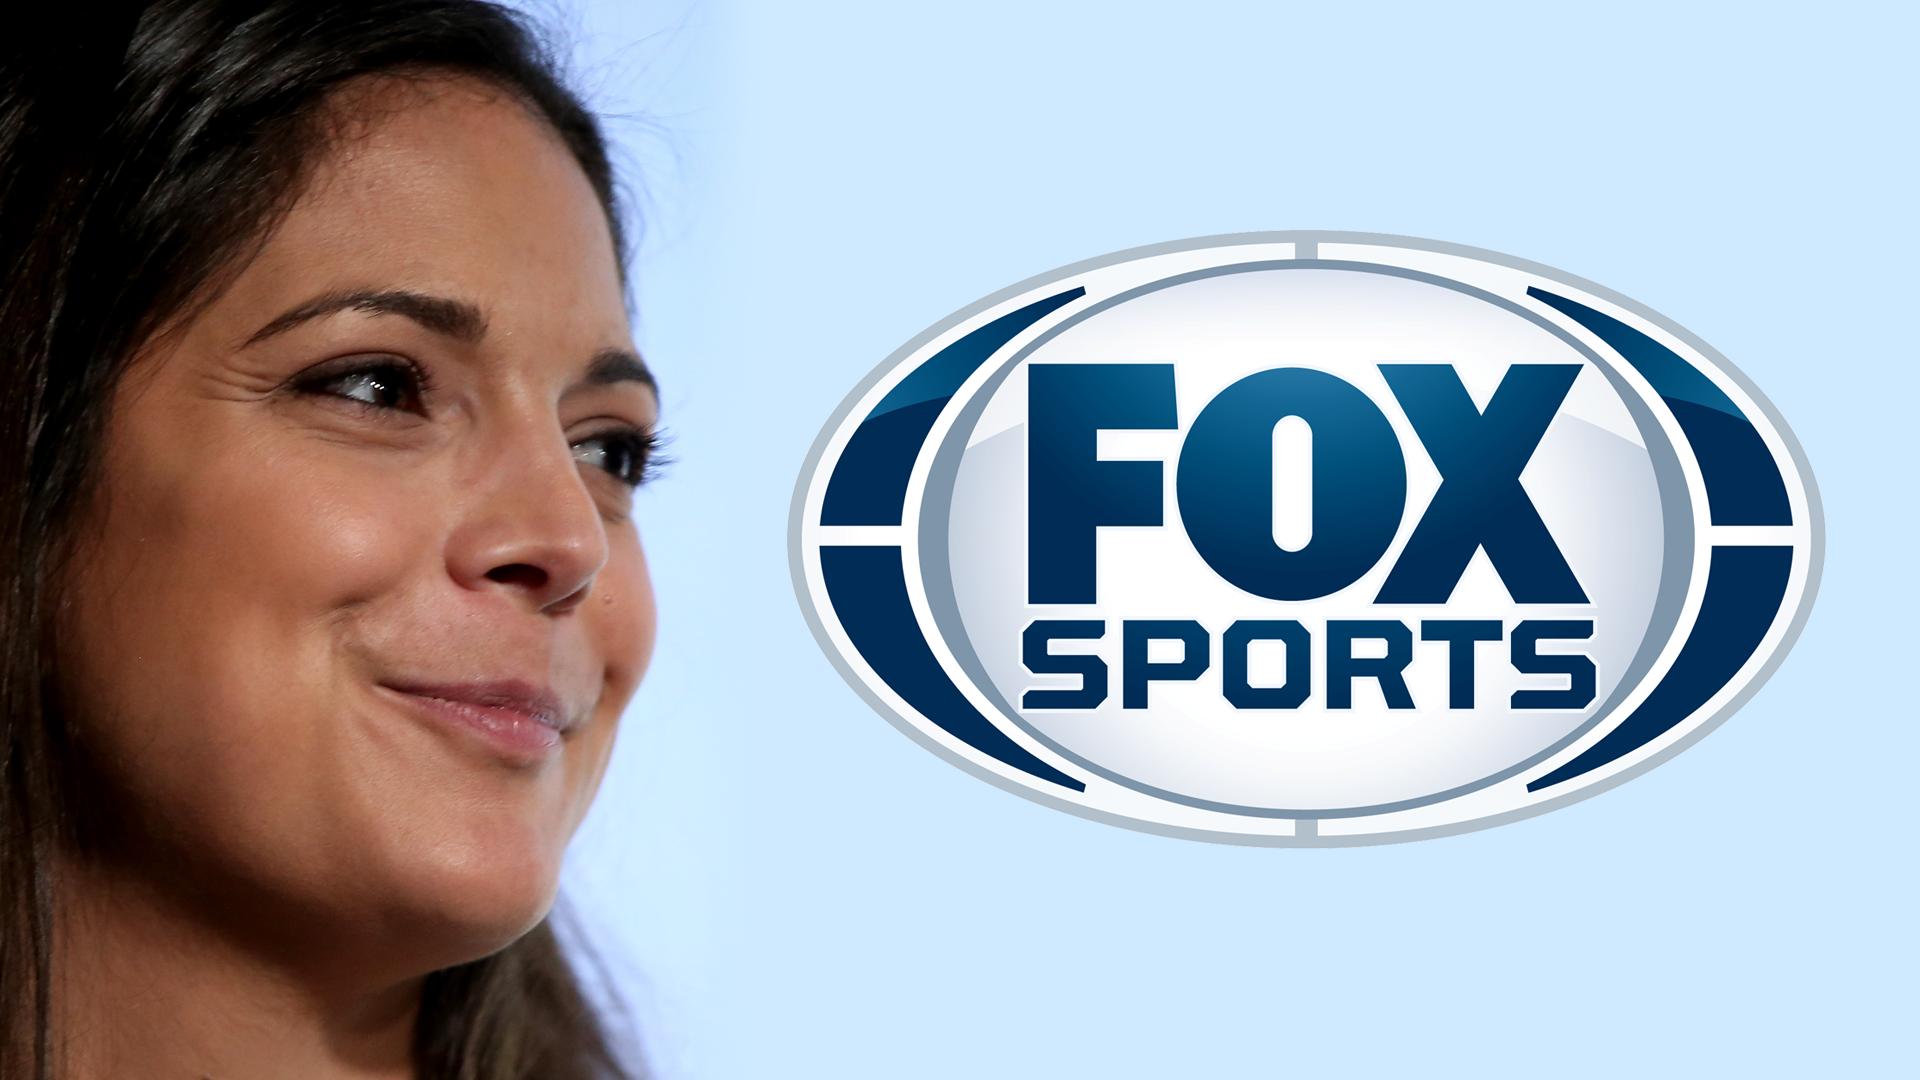 Fox sports harold reynolds sexual harassment